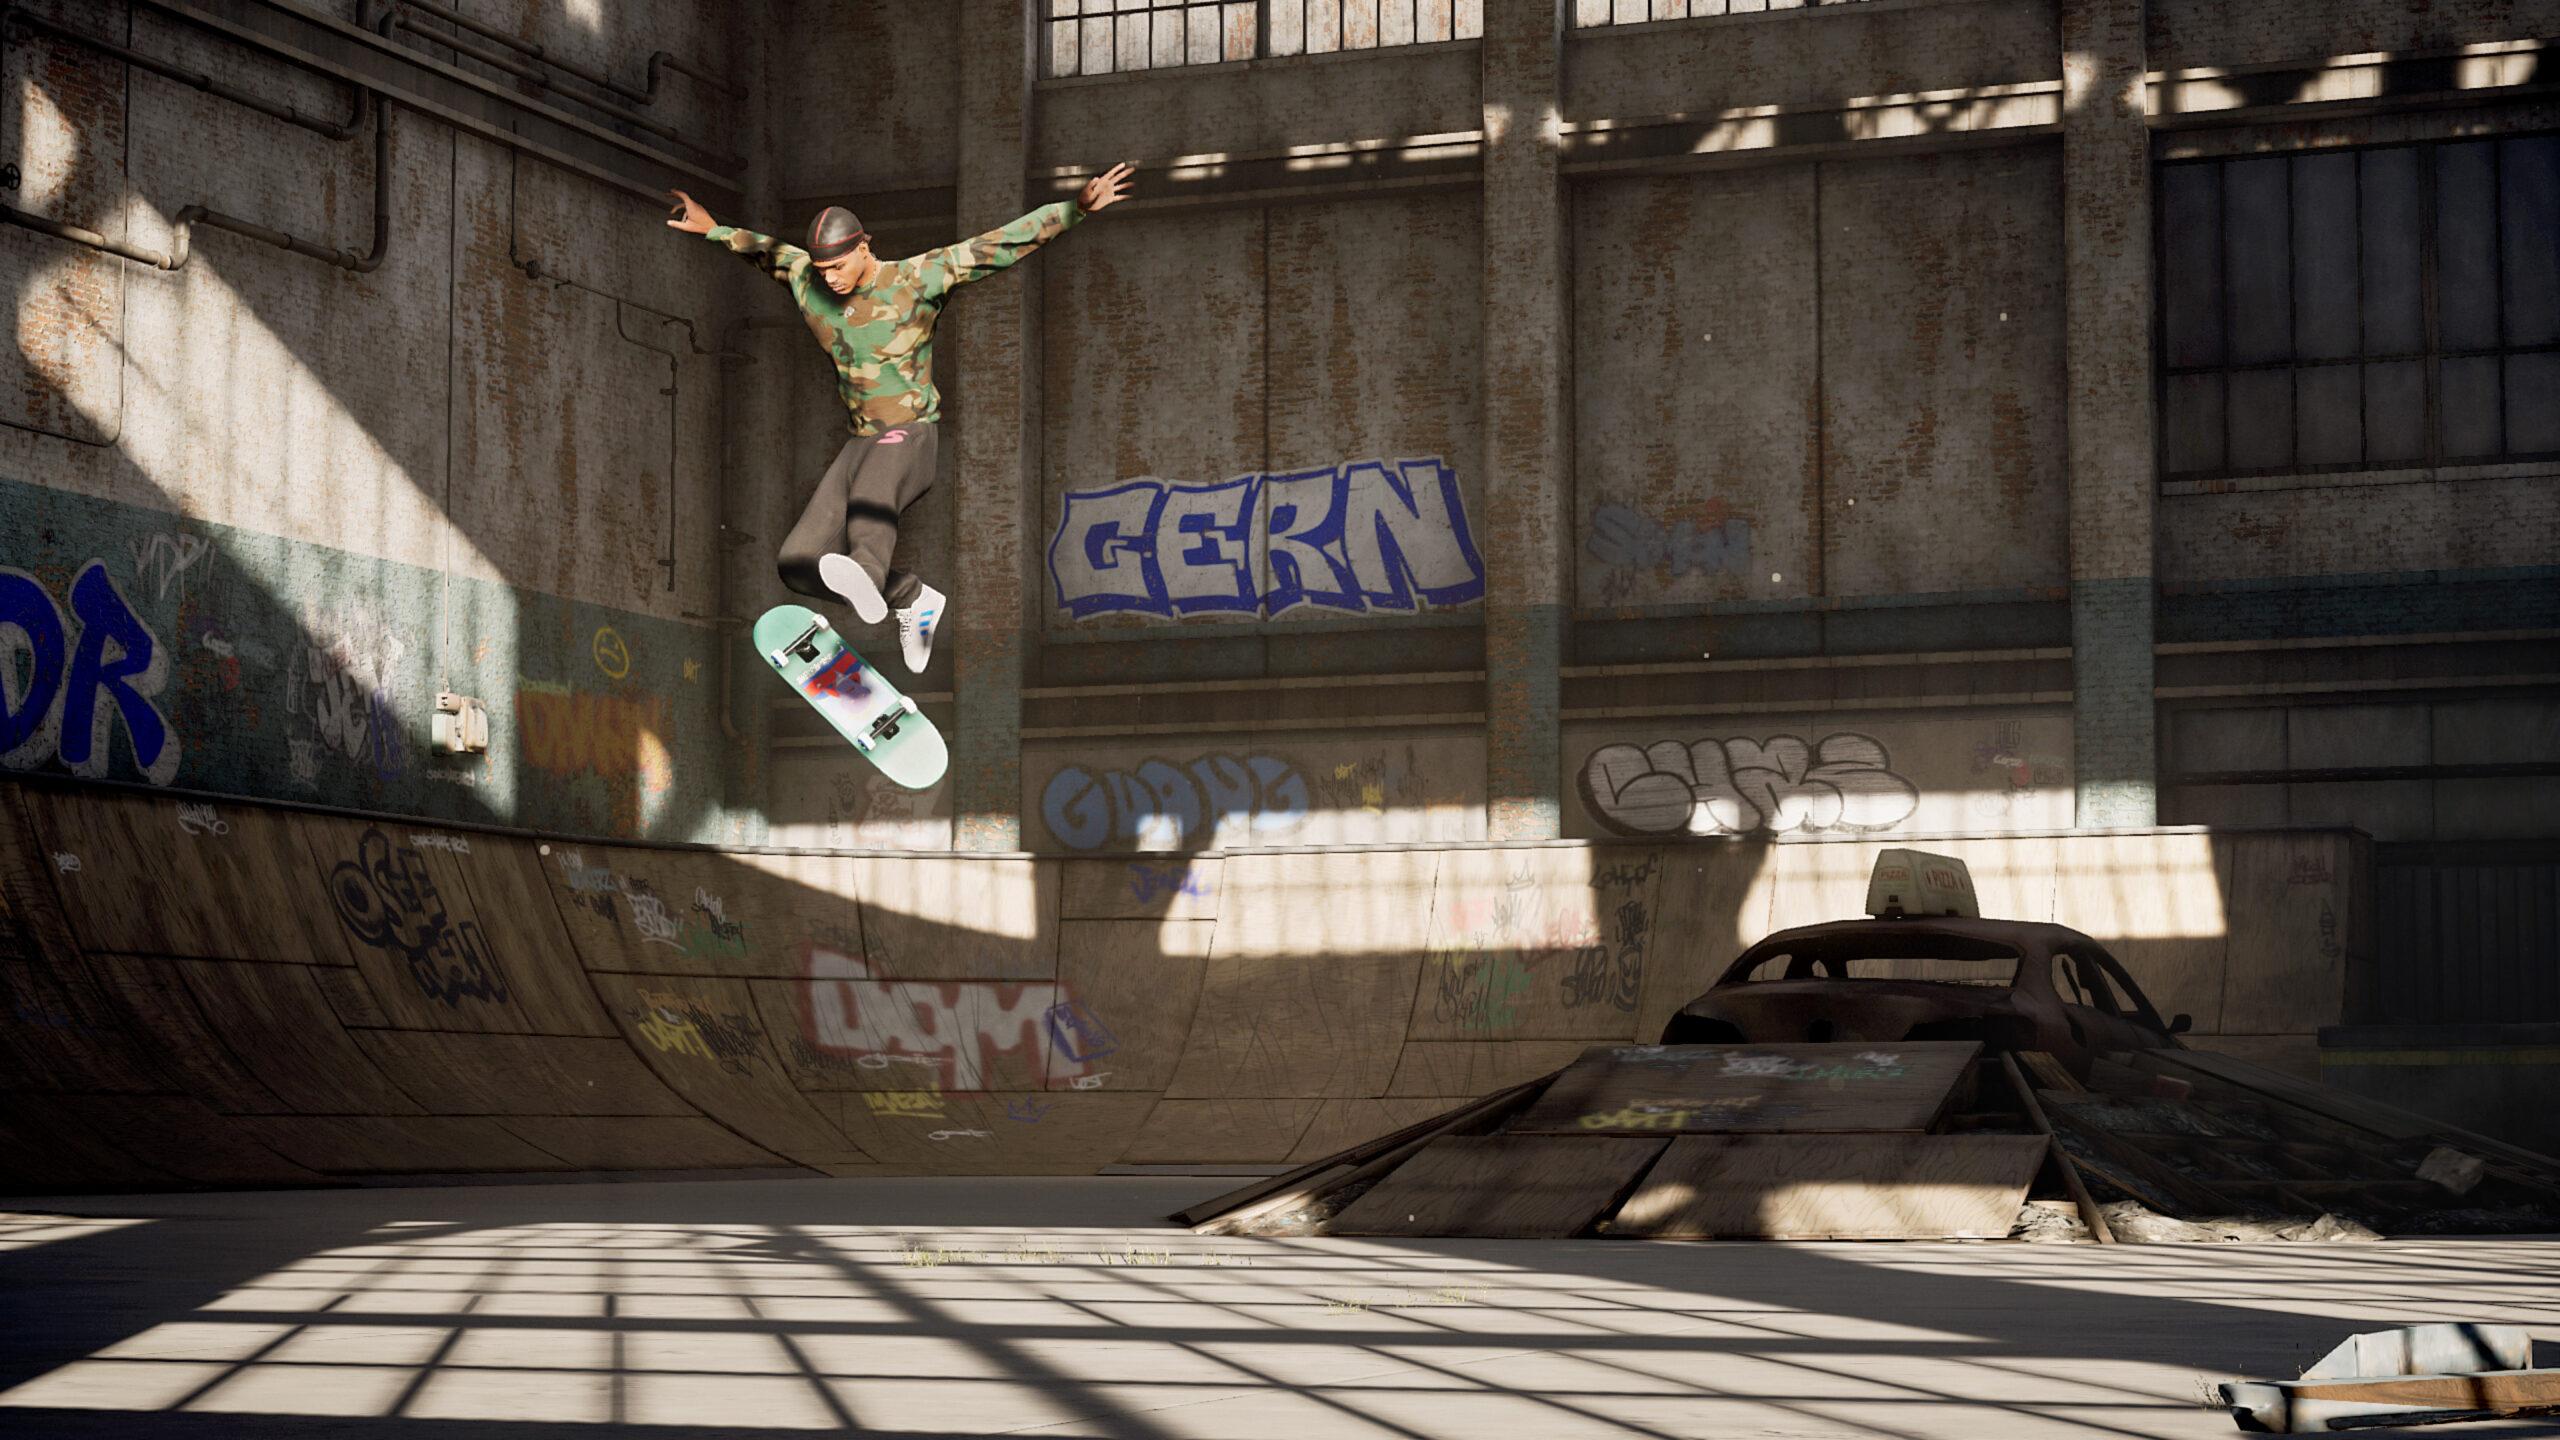 tony hawk's pro skater update 1.07